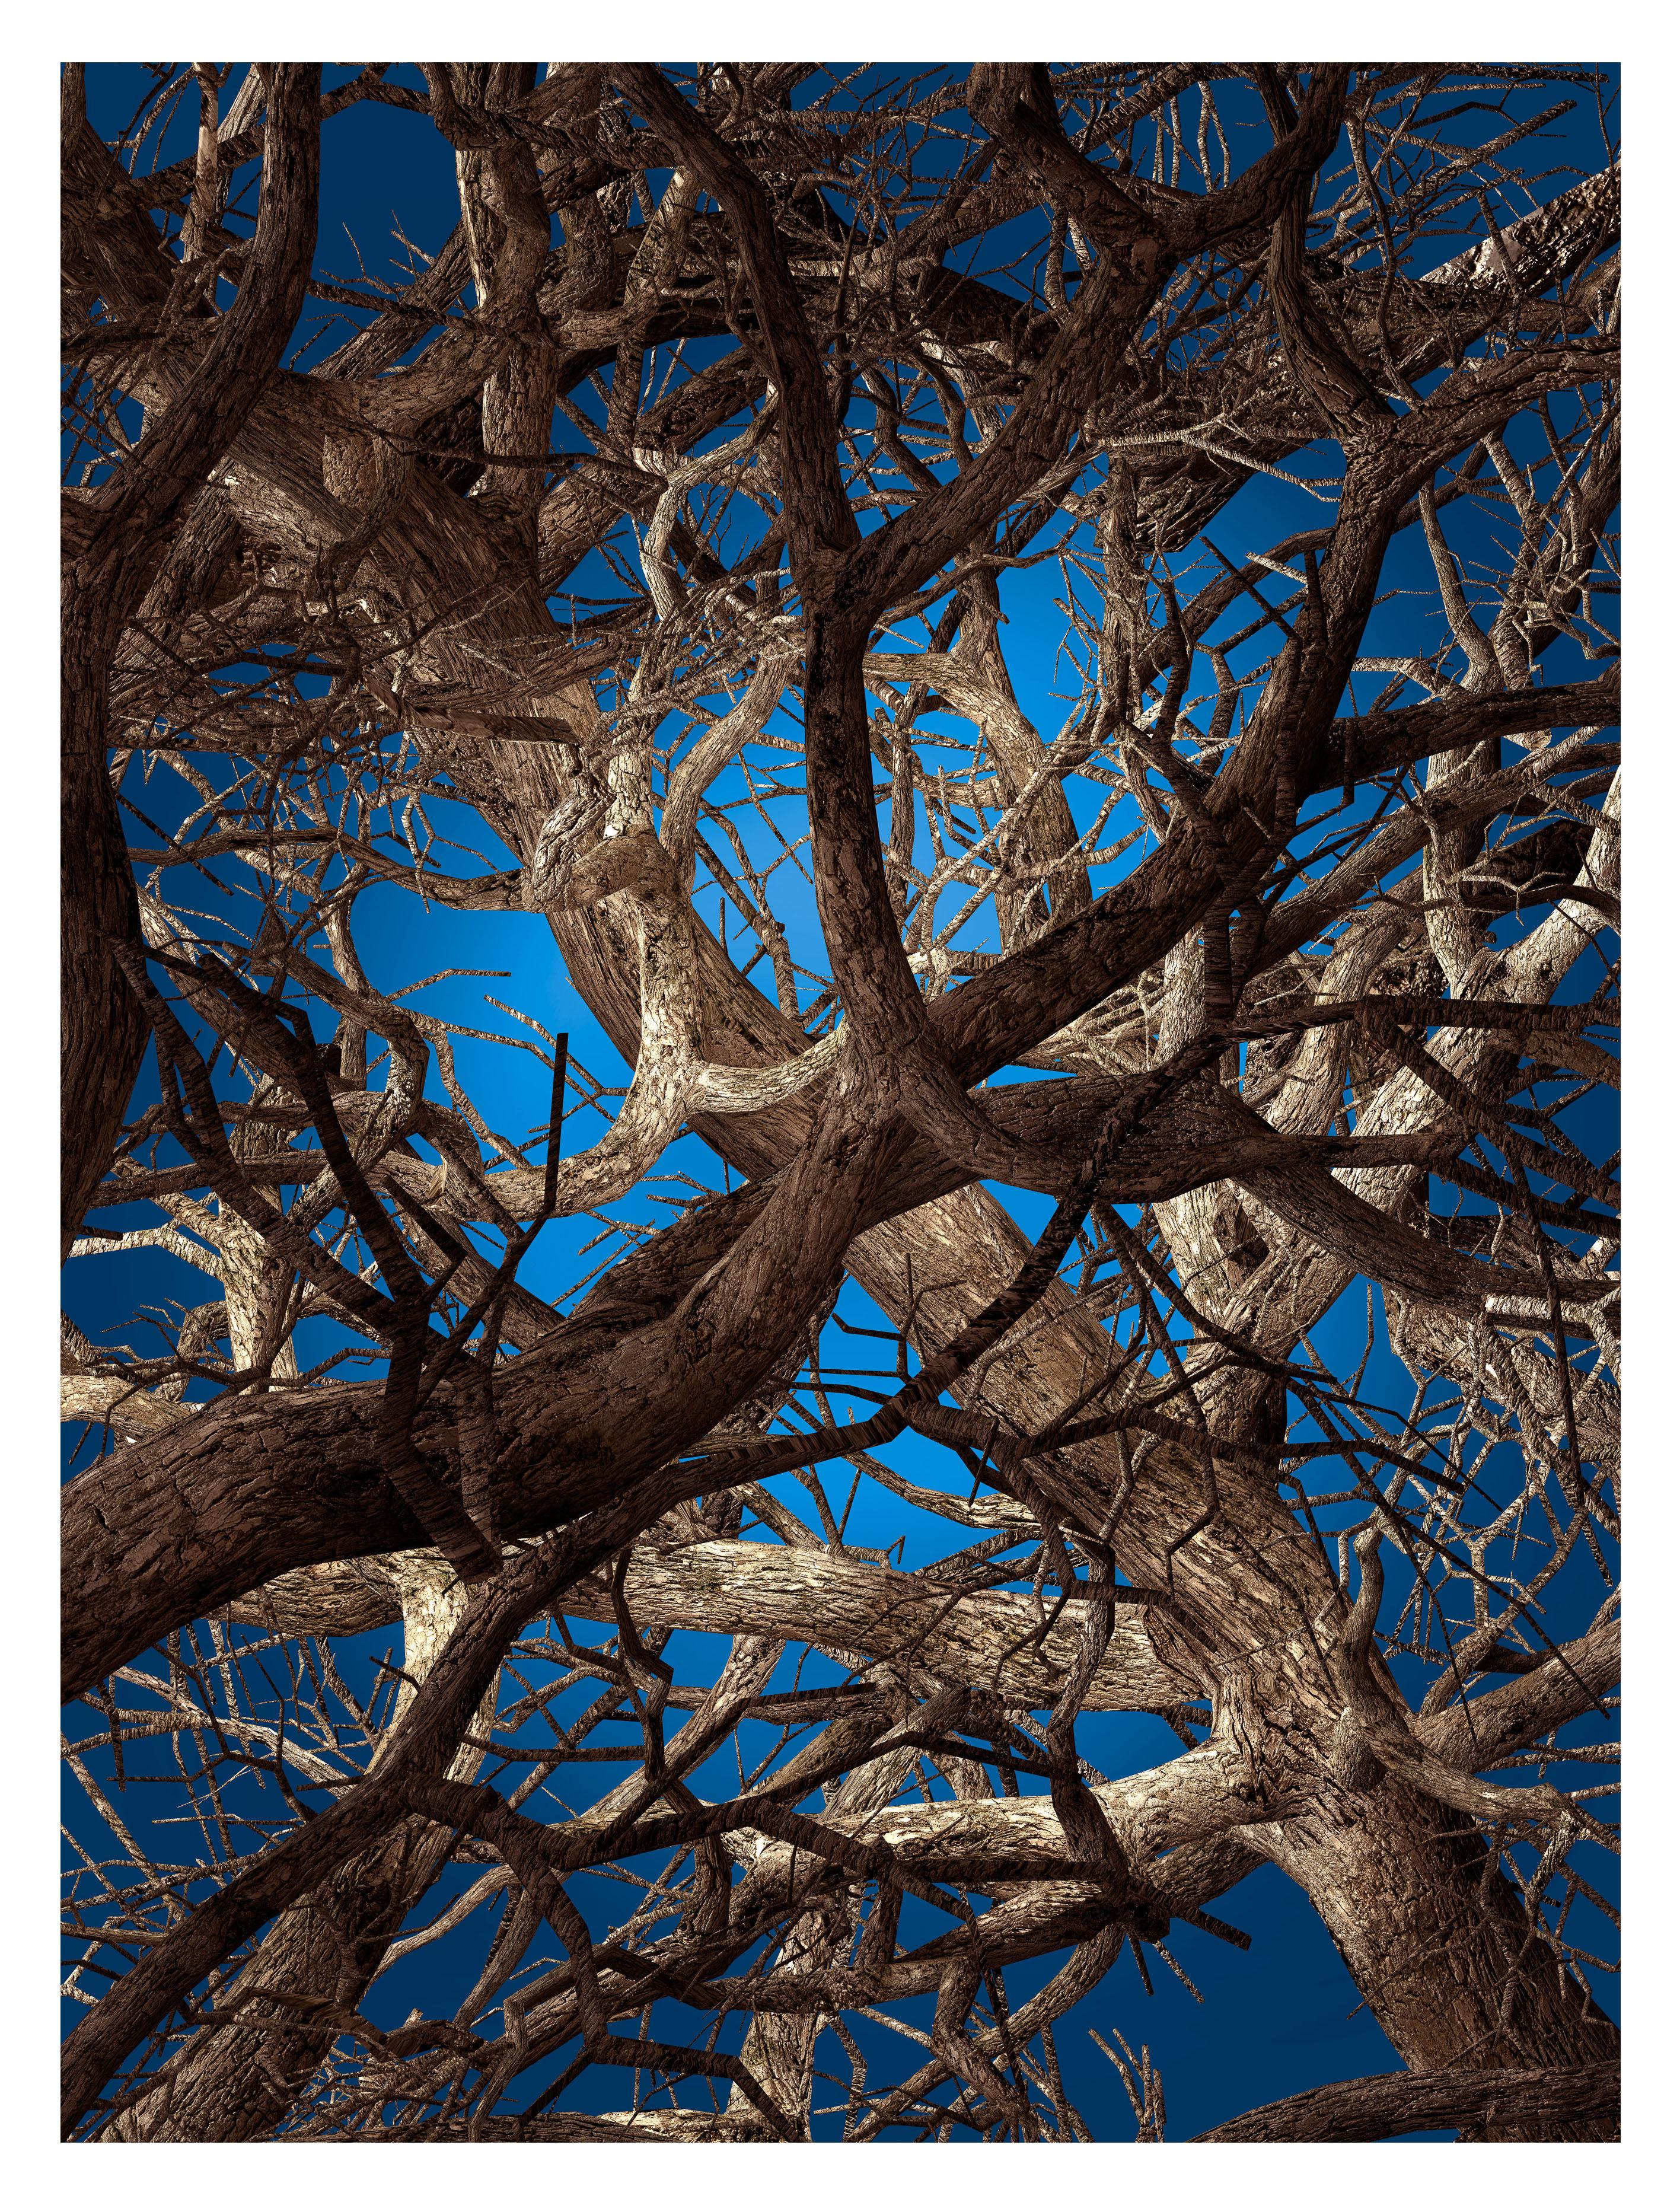 Dekoration - Teppiche - Liquid Maple Teppich / 400 x 300 cm - Moooi Carpets - Ahorn - Polyamid